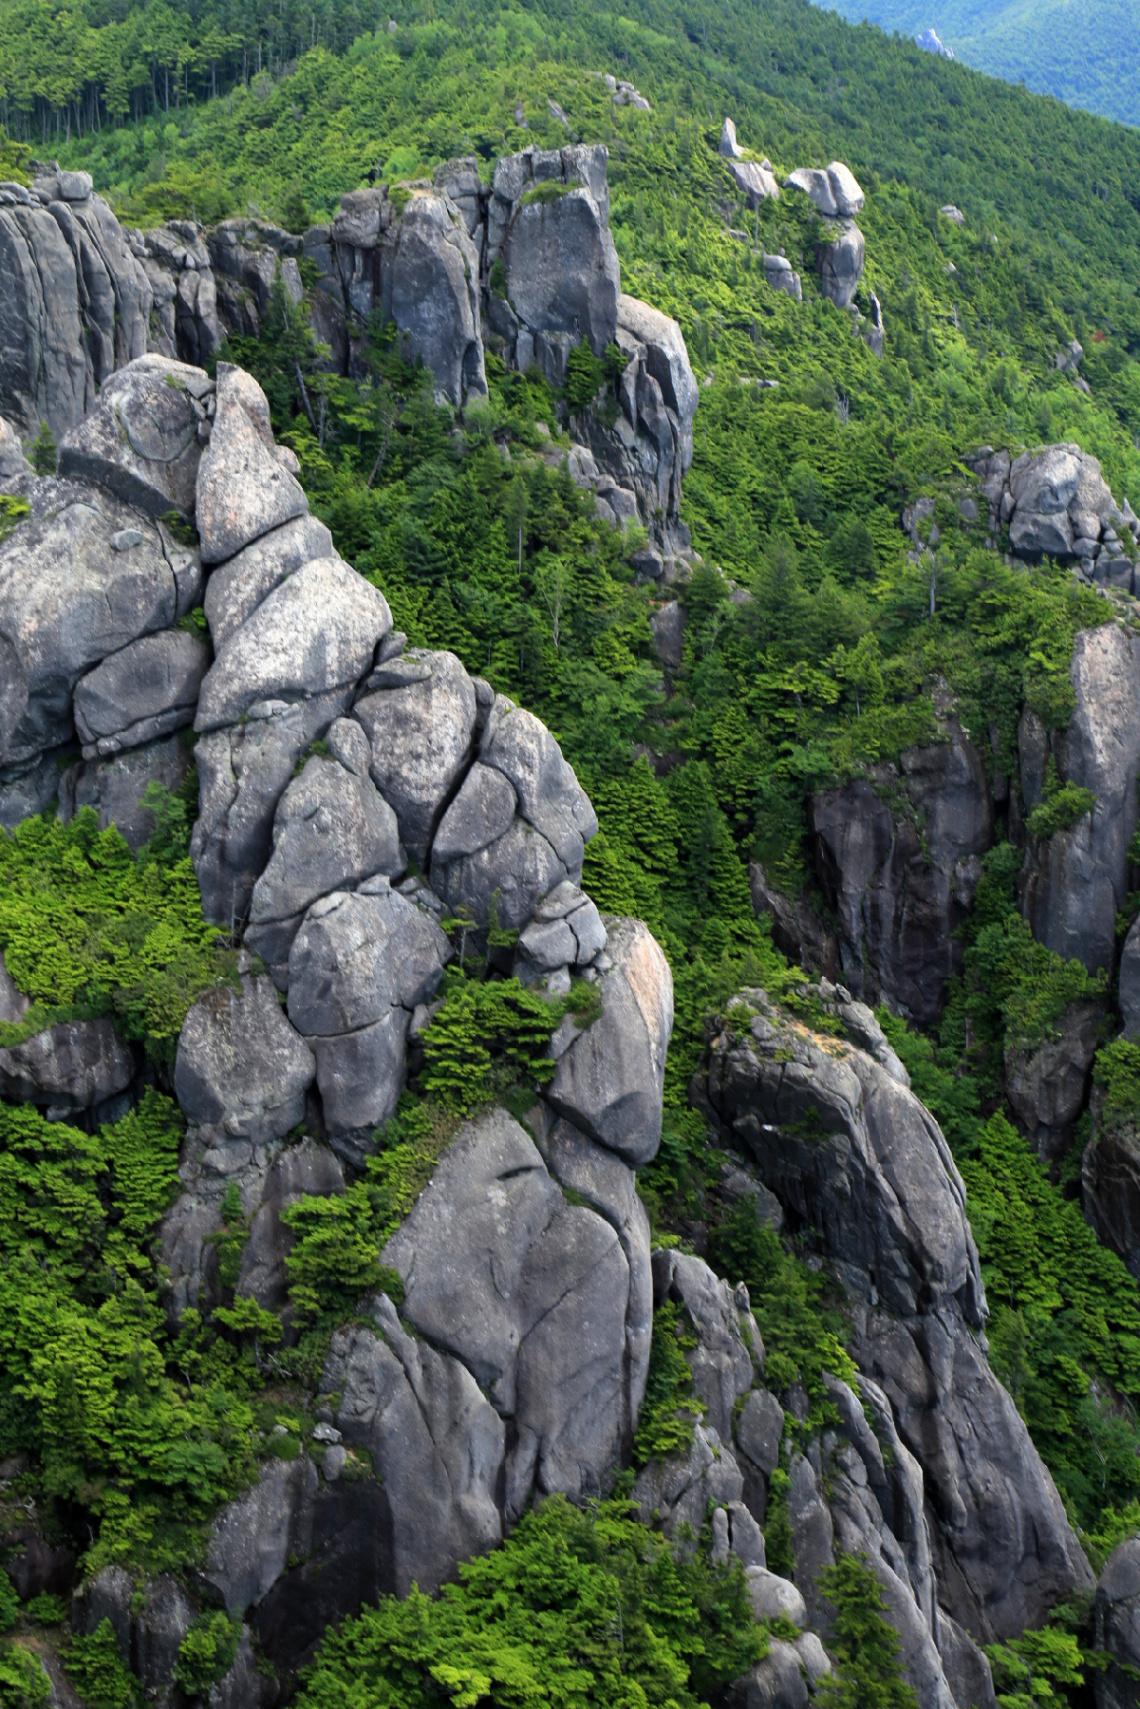 Rocks & green